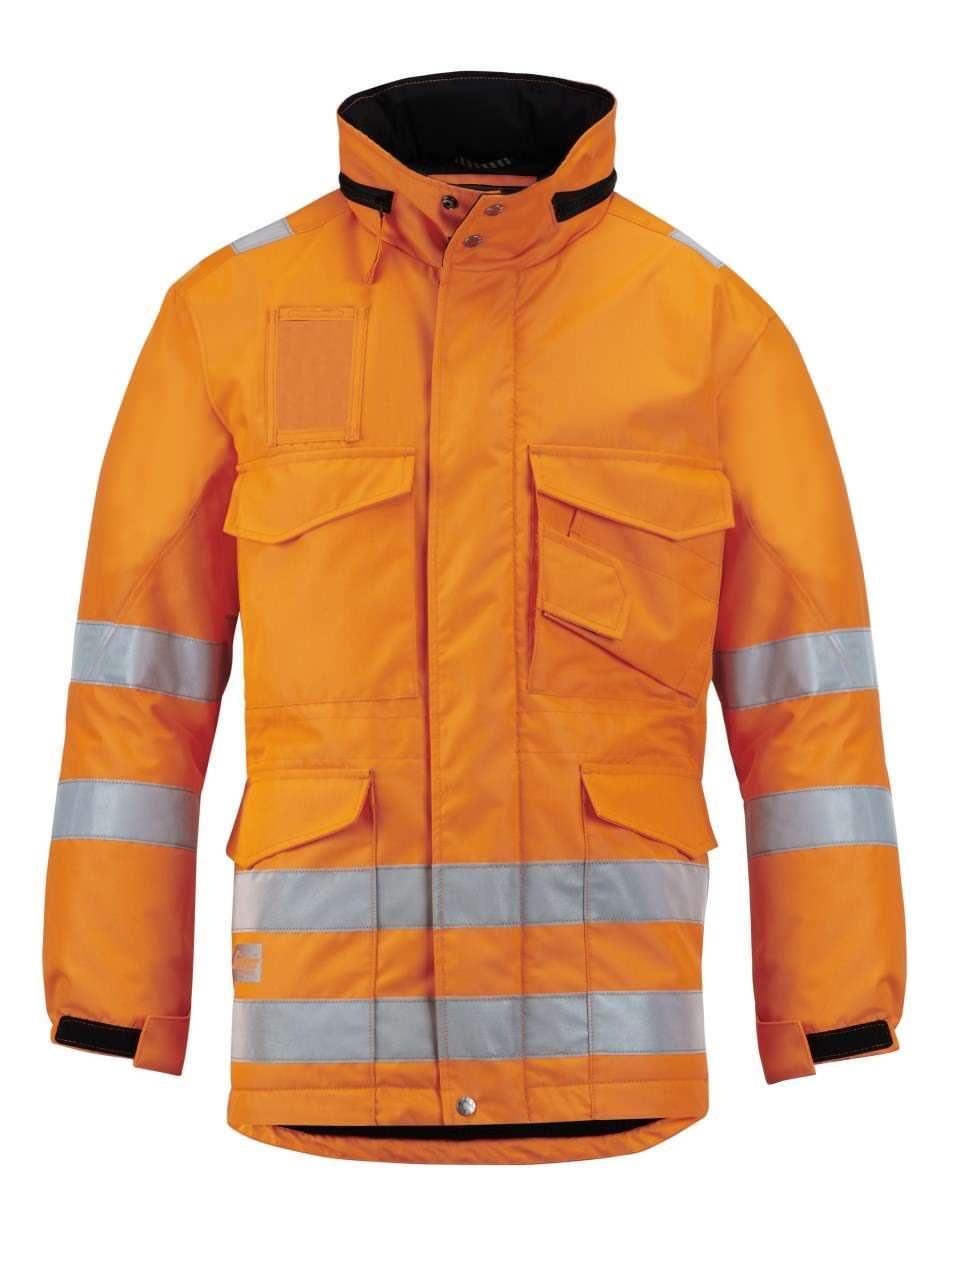 Snickers 1823 High-Vis Winter Long Jacket, Class 3